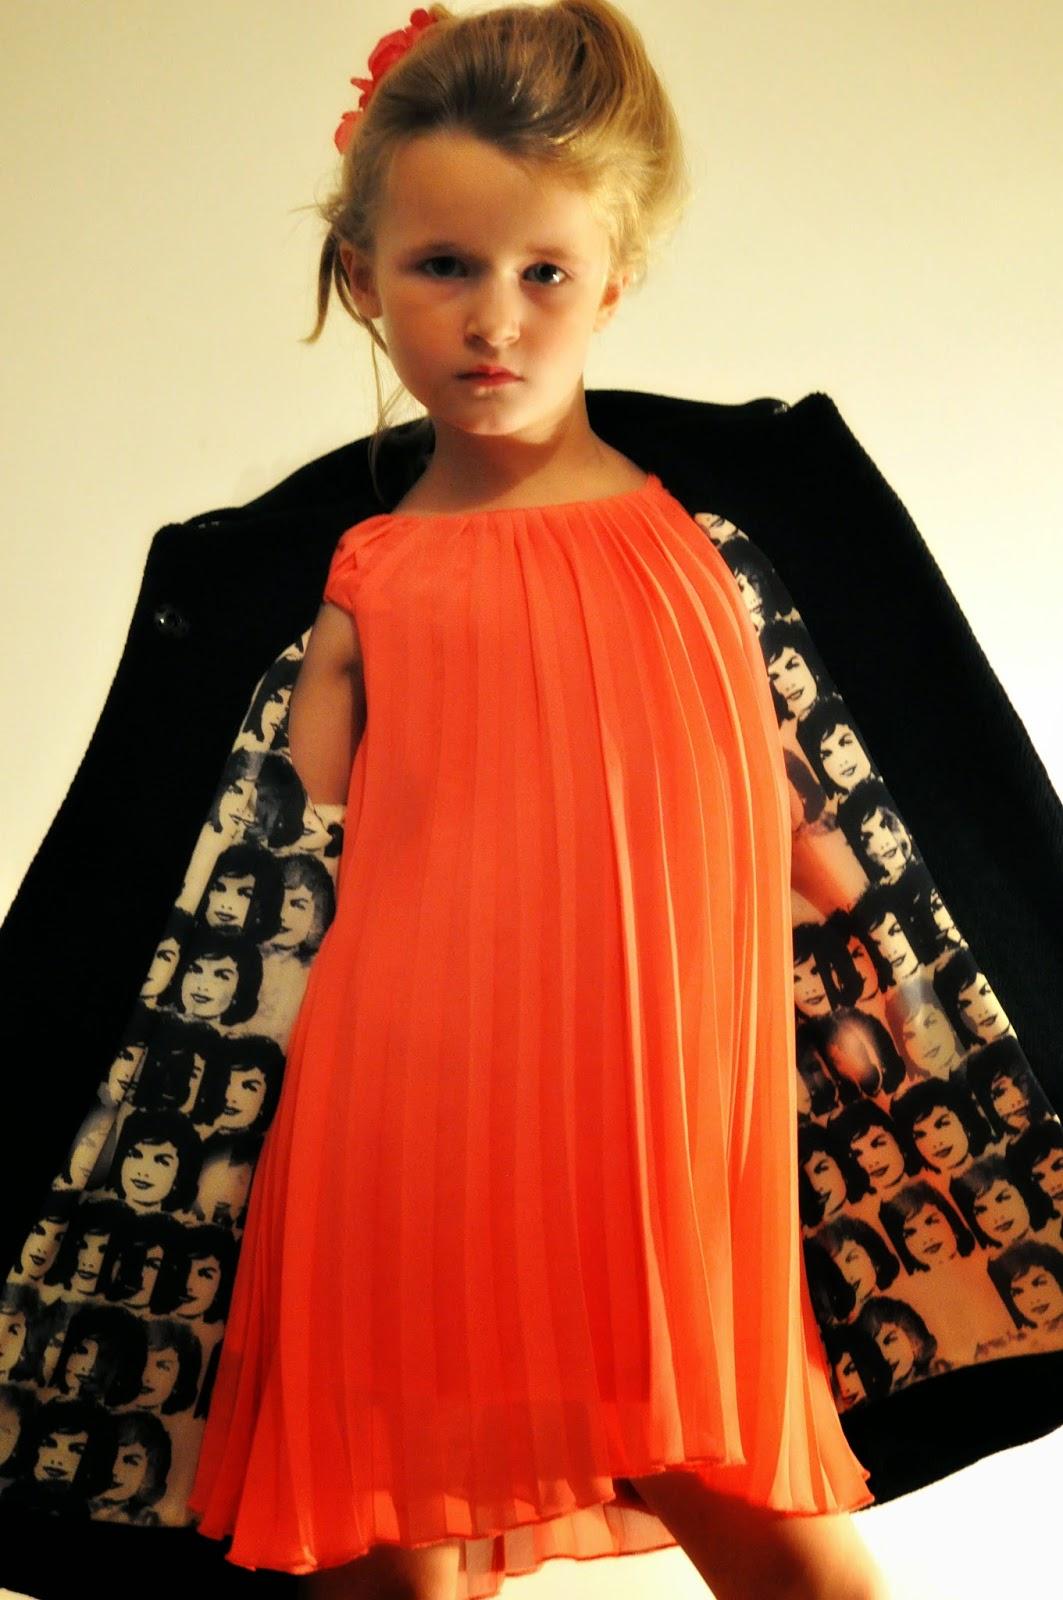 Jackie jas Iene Miene naaien sewing kindermode DIY kinderkleding fabric sales